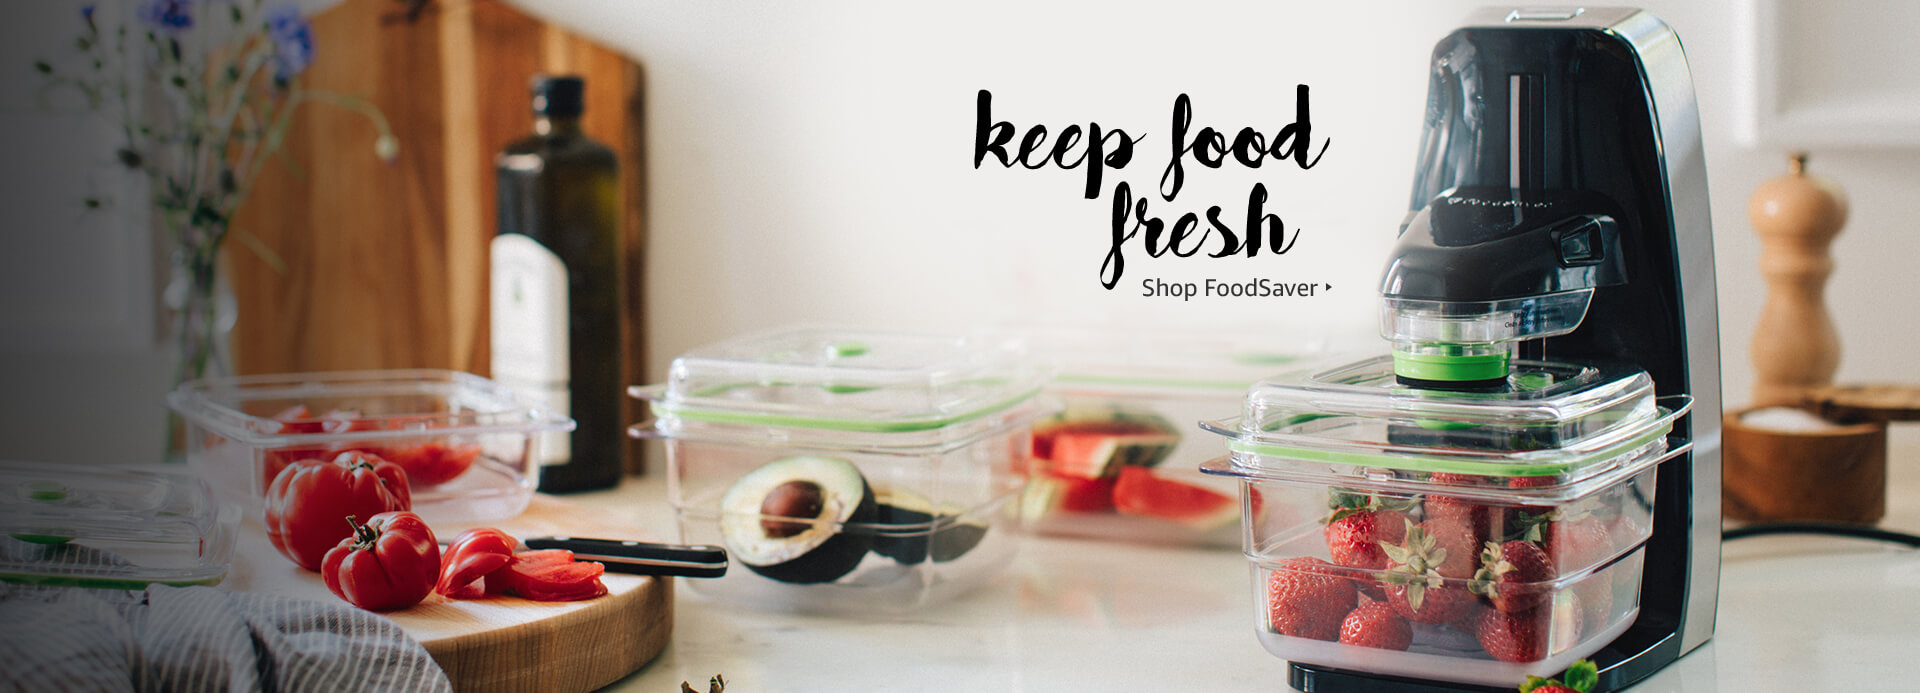 Keep food fresh with FoodSaver